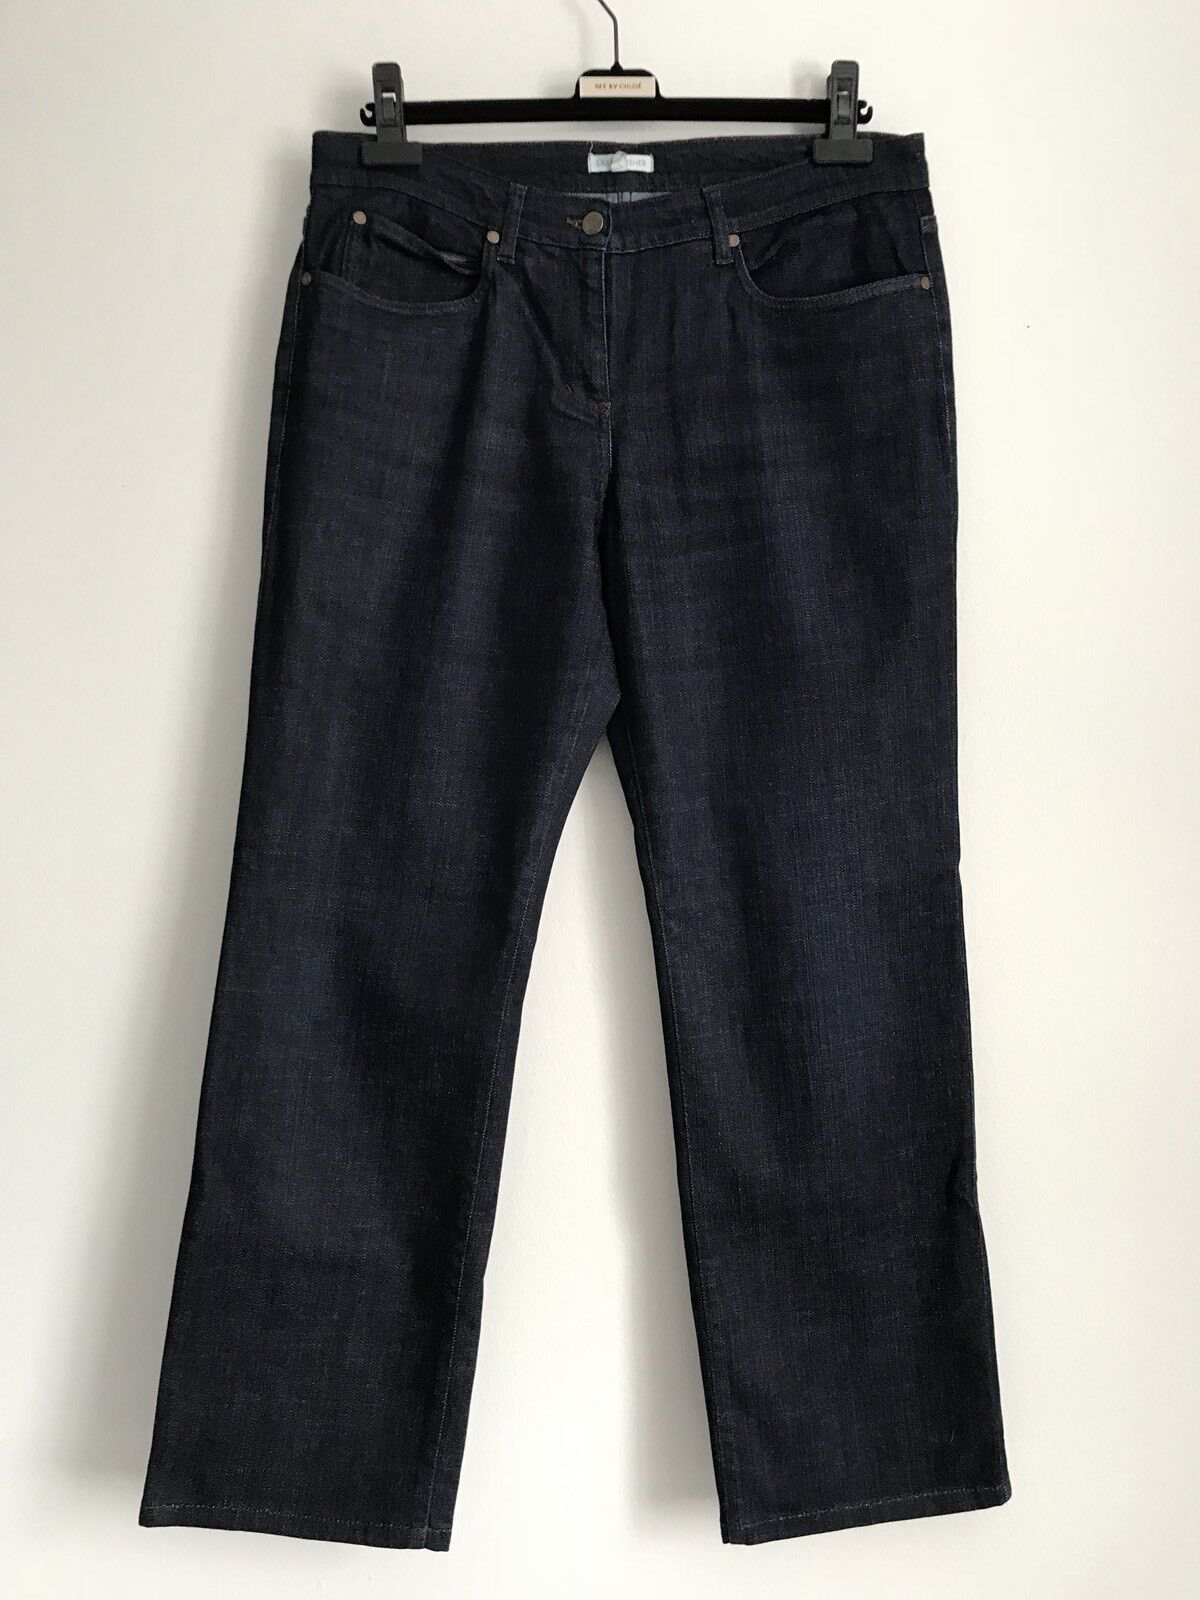 Eileen Fisher  Organic Cotton Elastane bluee Stretchy Women's Jeans Size 12